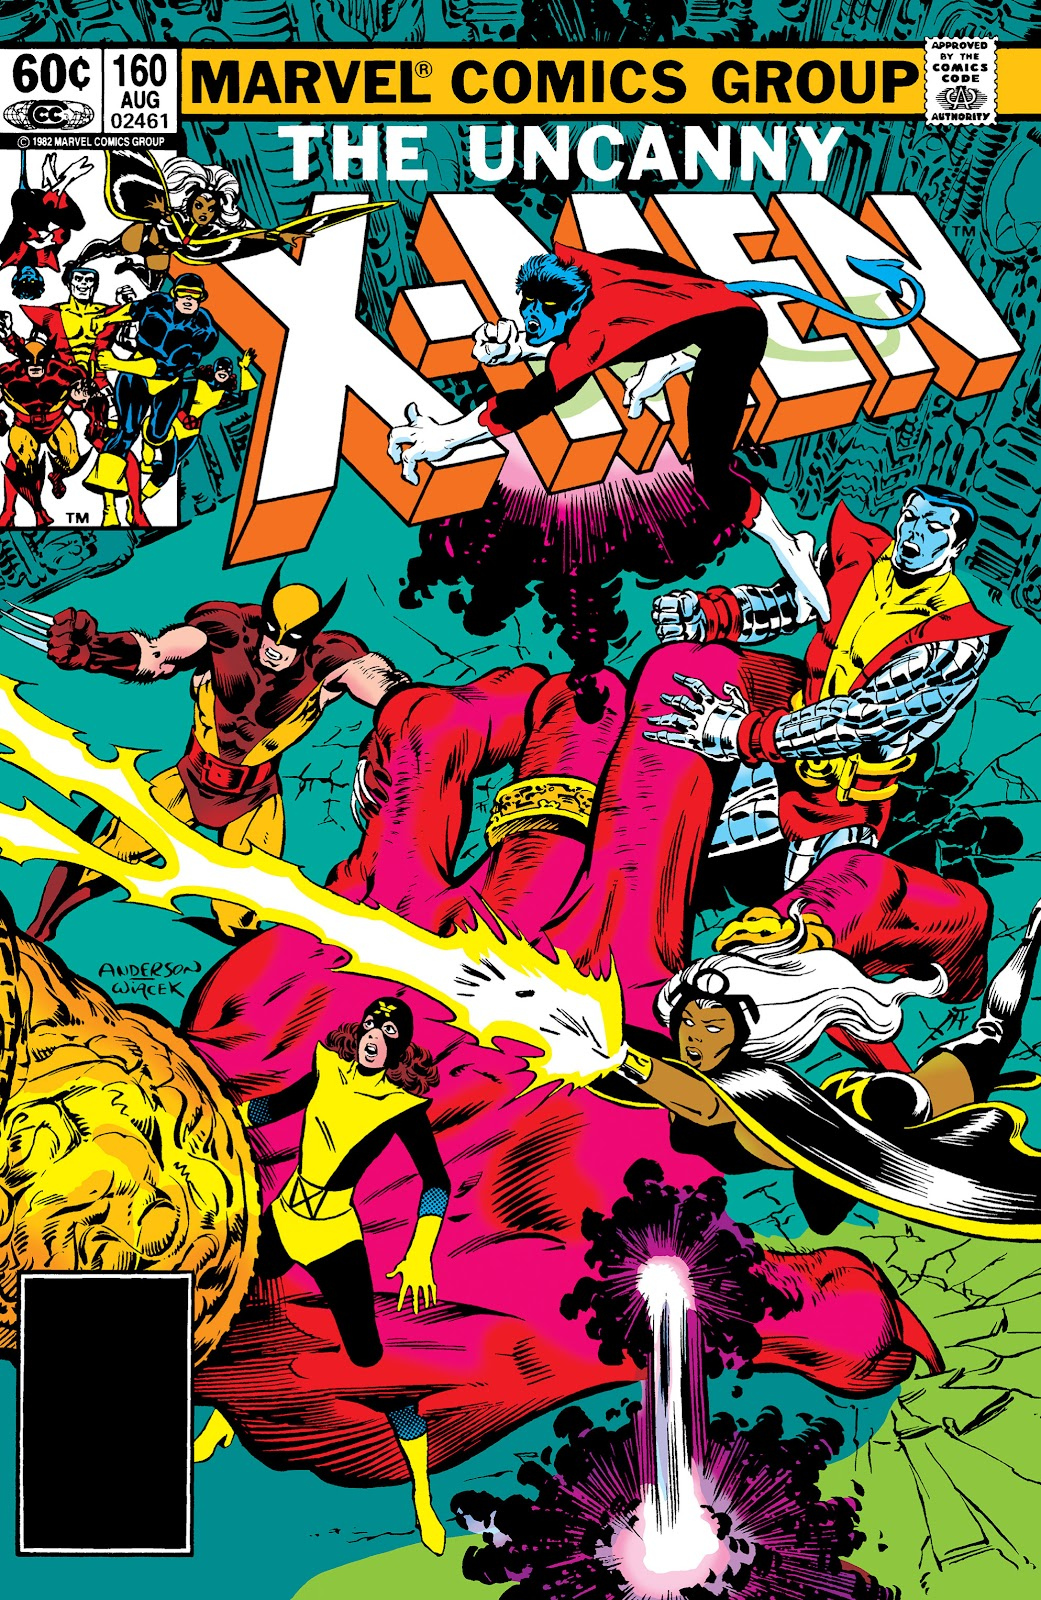 Uncanny X-Men (1963) issue 160 - Page 1